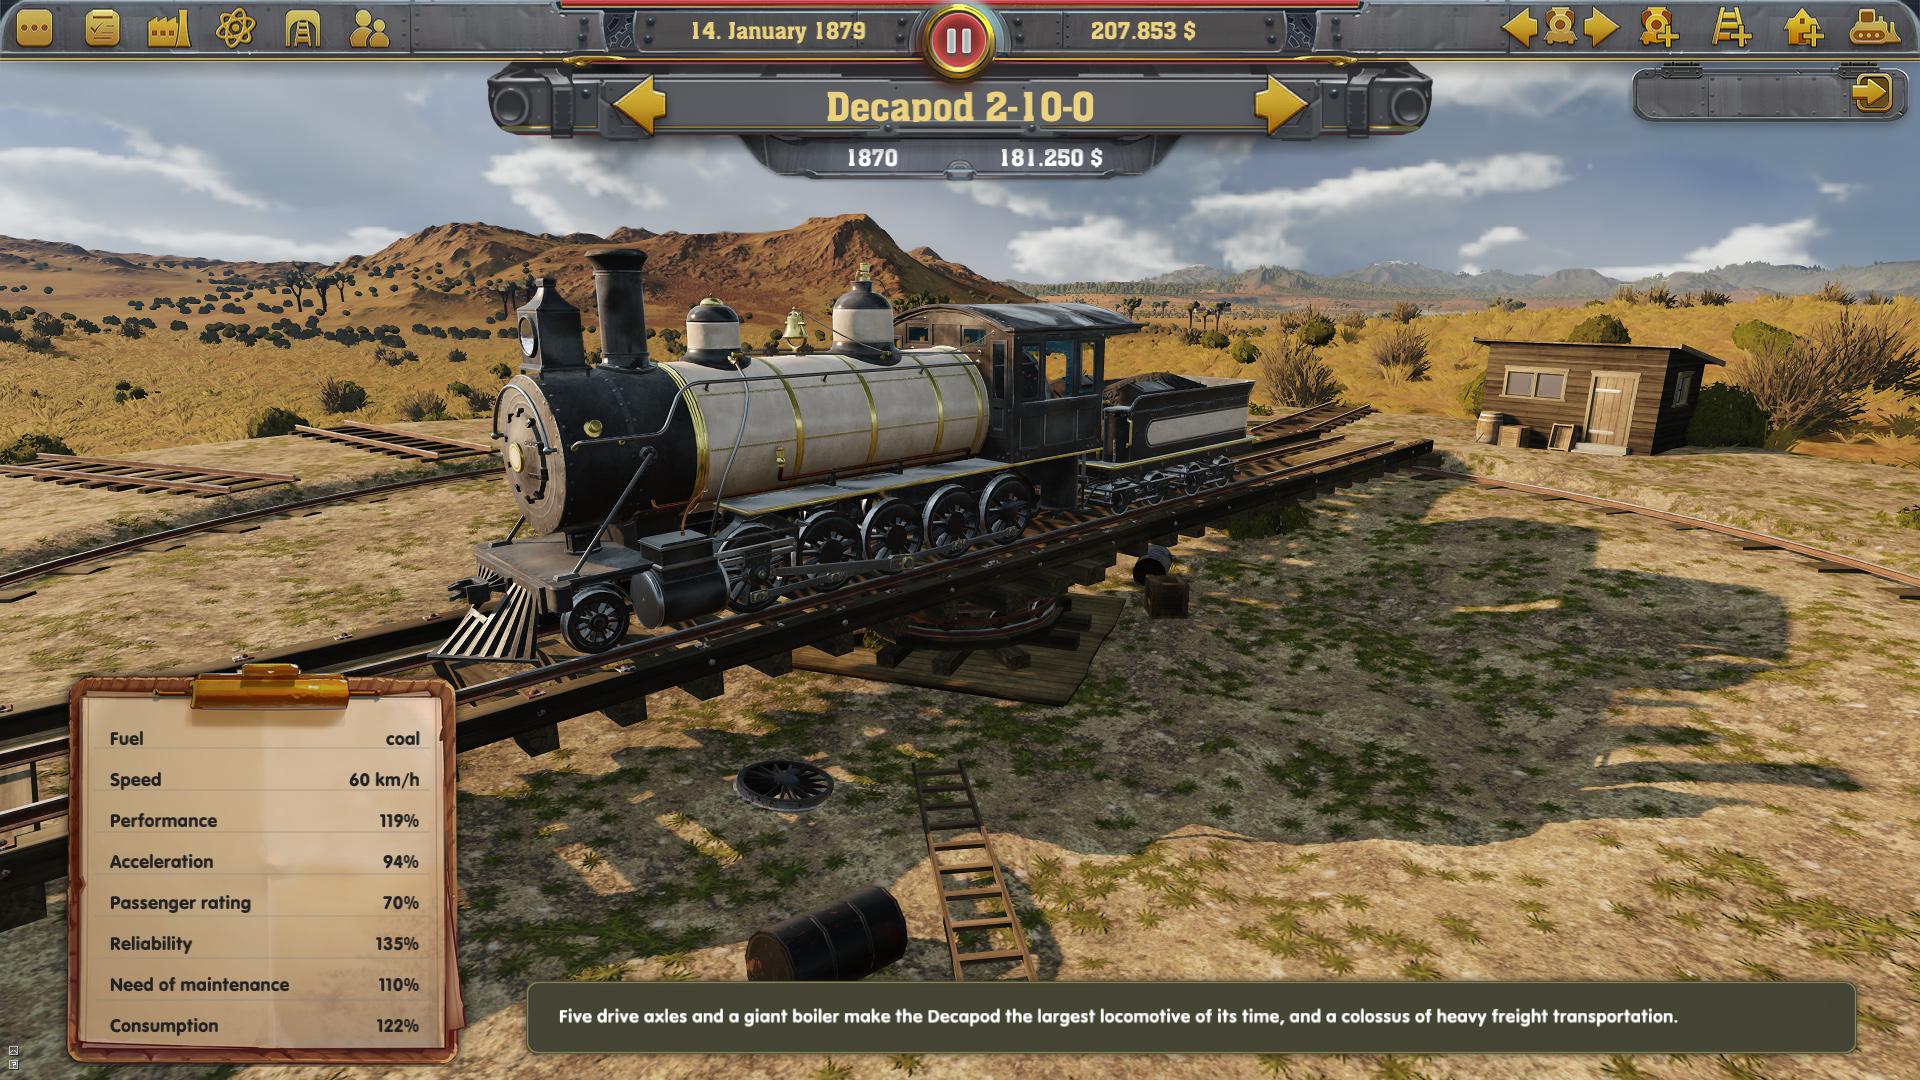 Railway Empire 04 - Railway Empire angekündigt - Tycoon-Simulation-Game